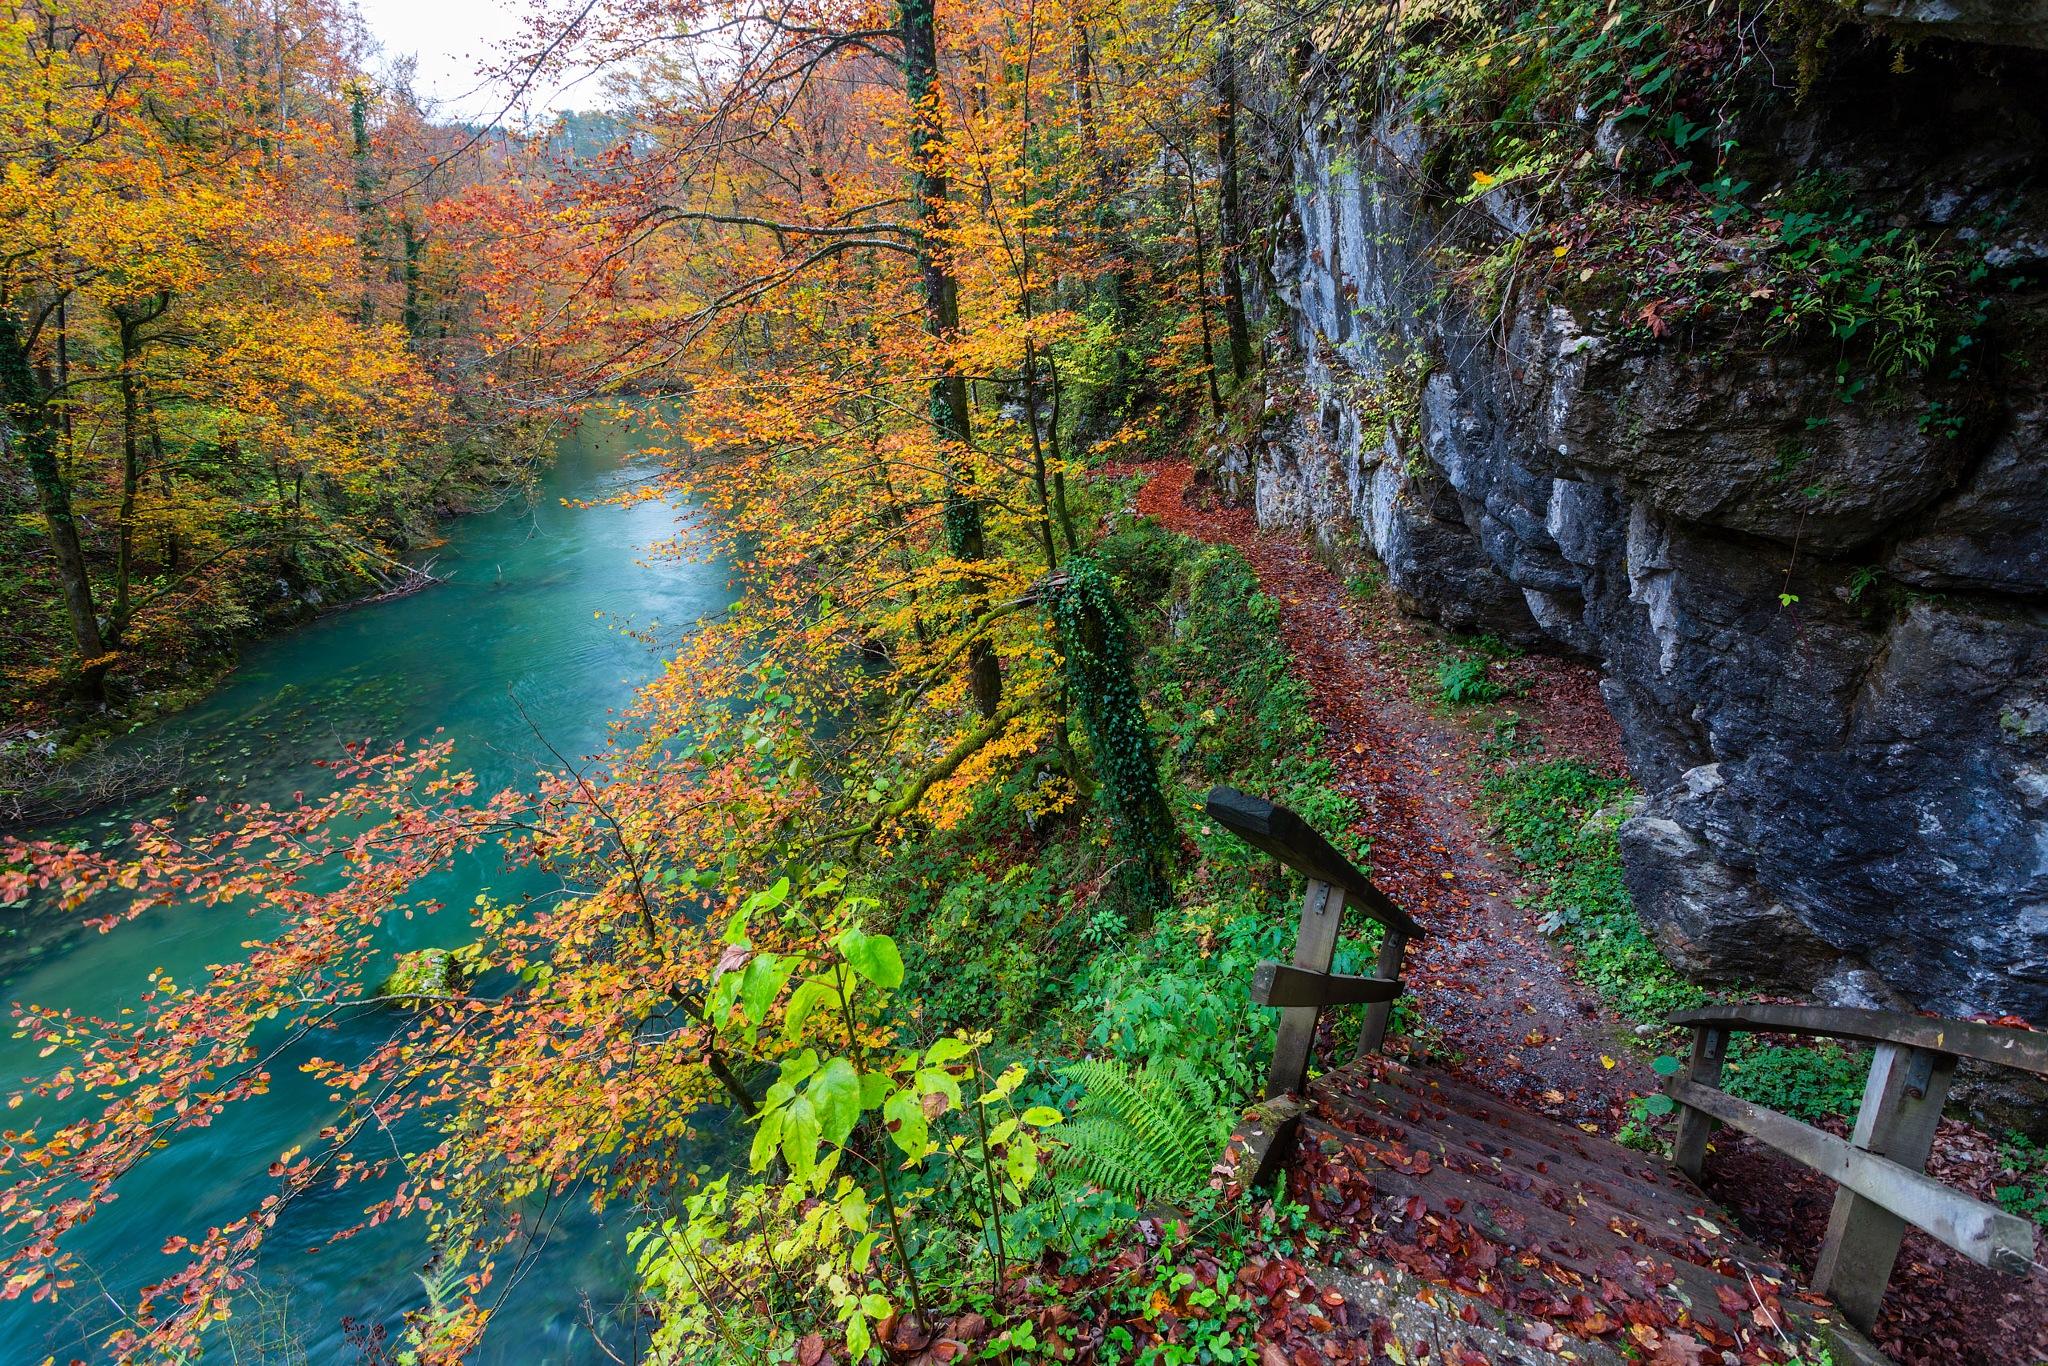 Canyon Kamacnik by stanislav.horacek2